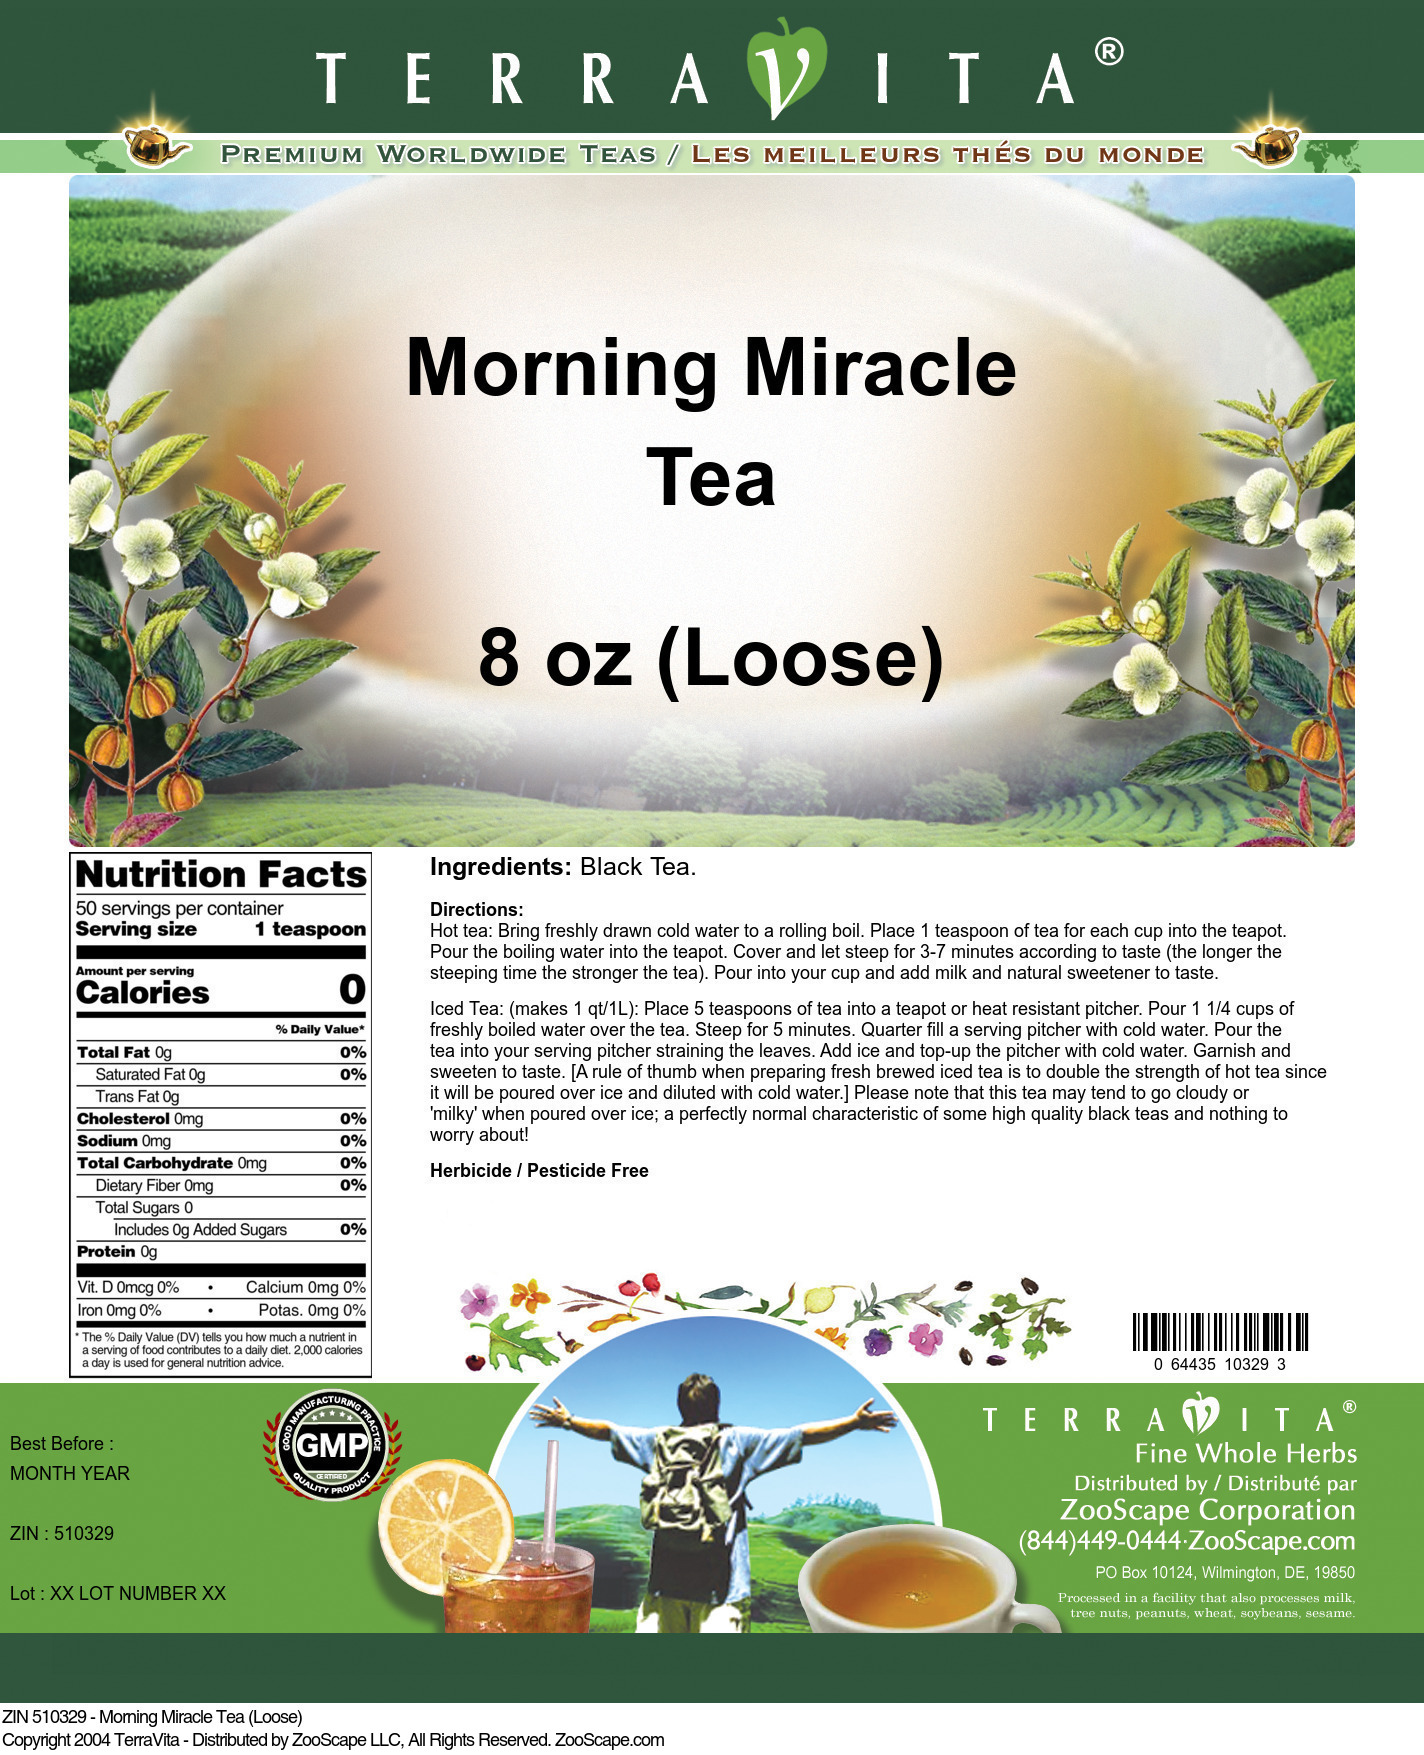 Morning Miracle Tea (Loose)